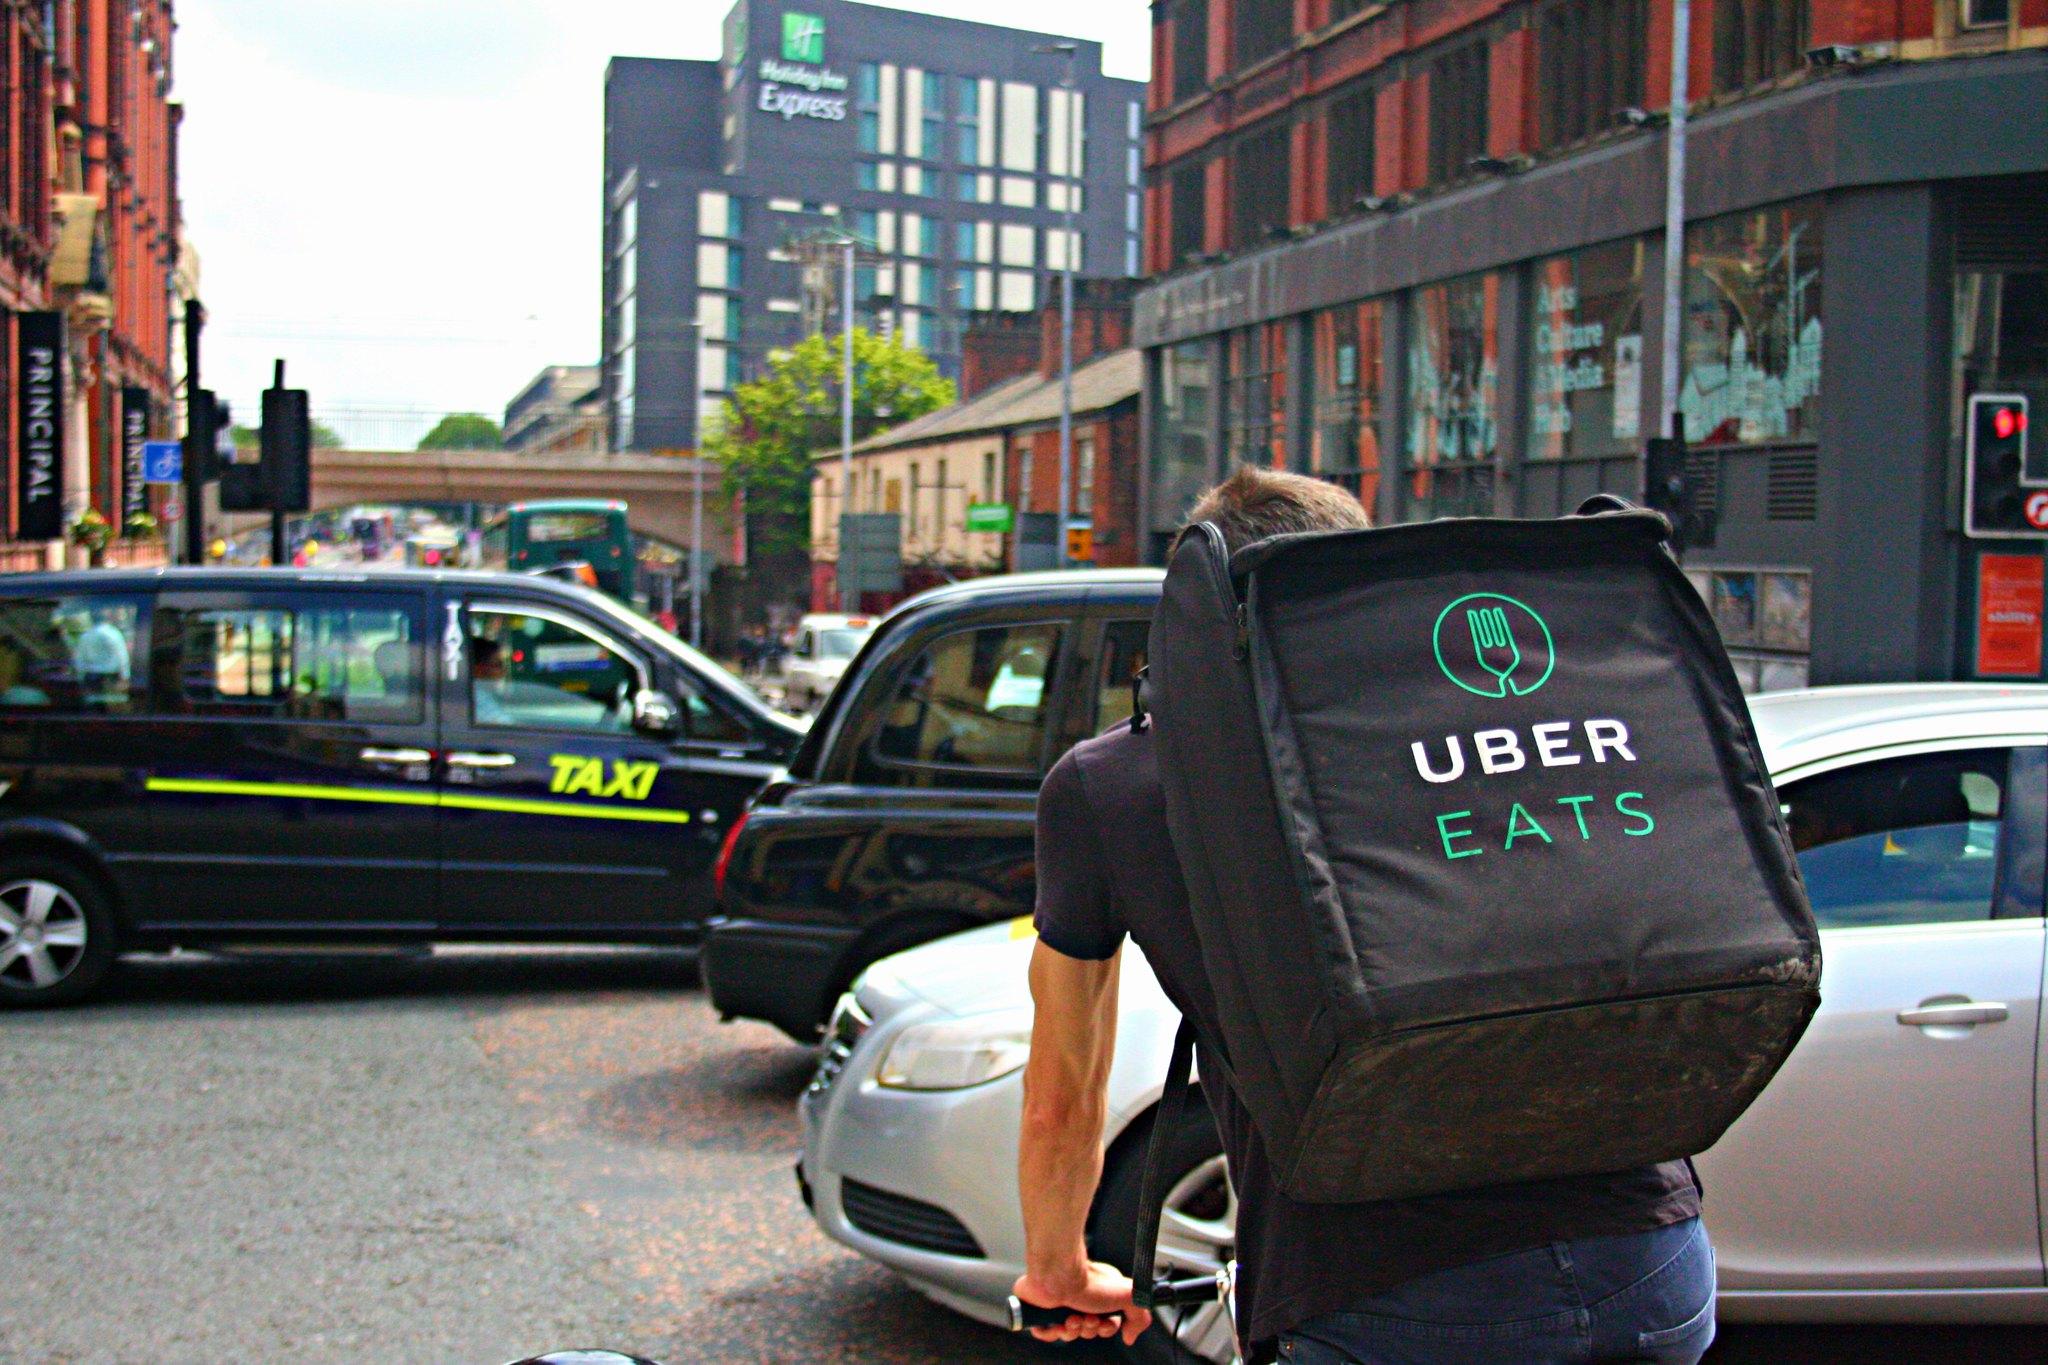 Uber Eats、月額980円のサブスクを日本で提供か